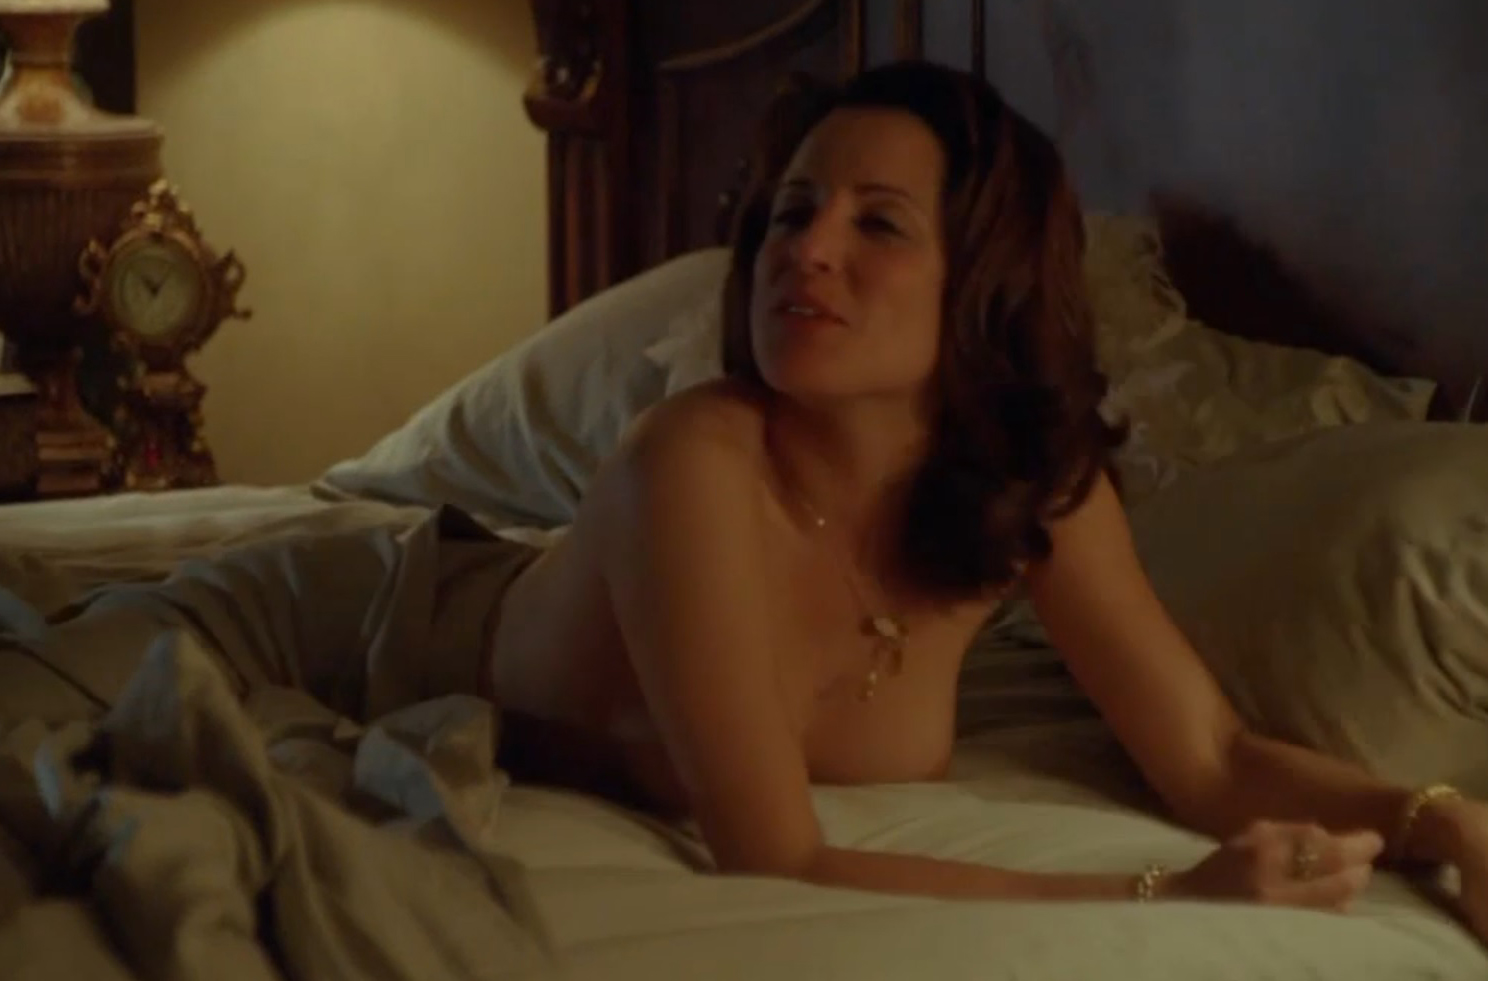 alanna-ubach-movie-sex-scene-young-virgin-pussy-movie